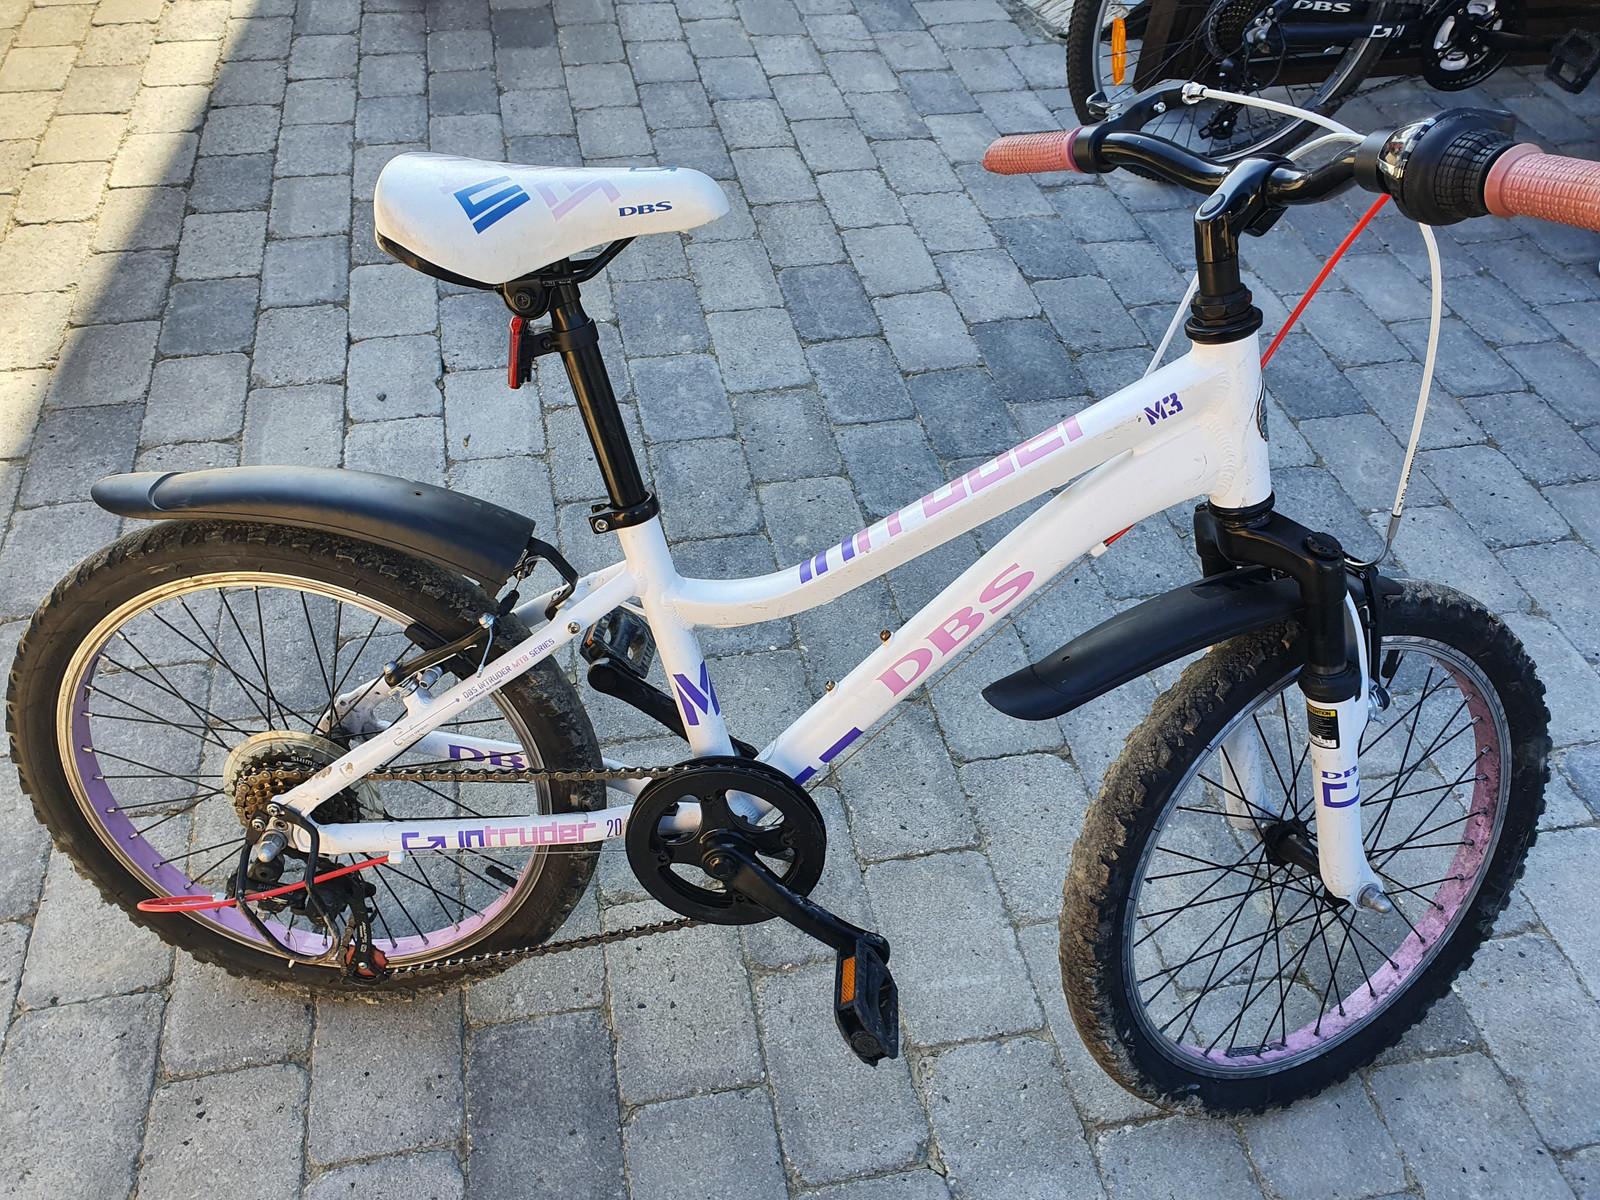 Dbs sykkel 20' | FINN.no